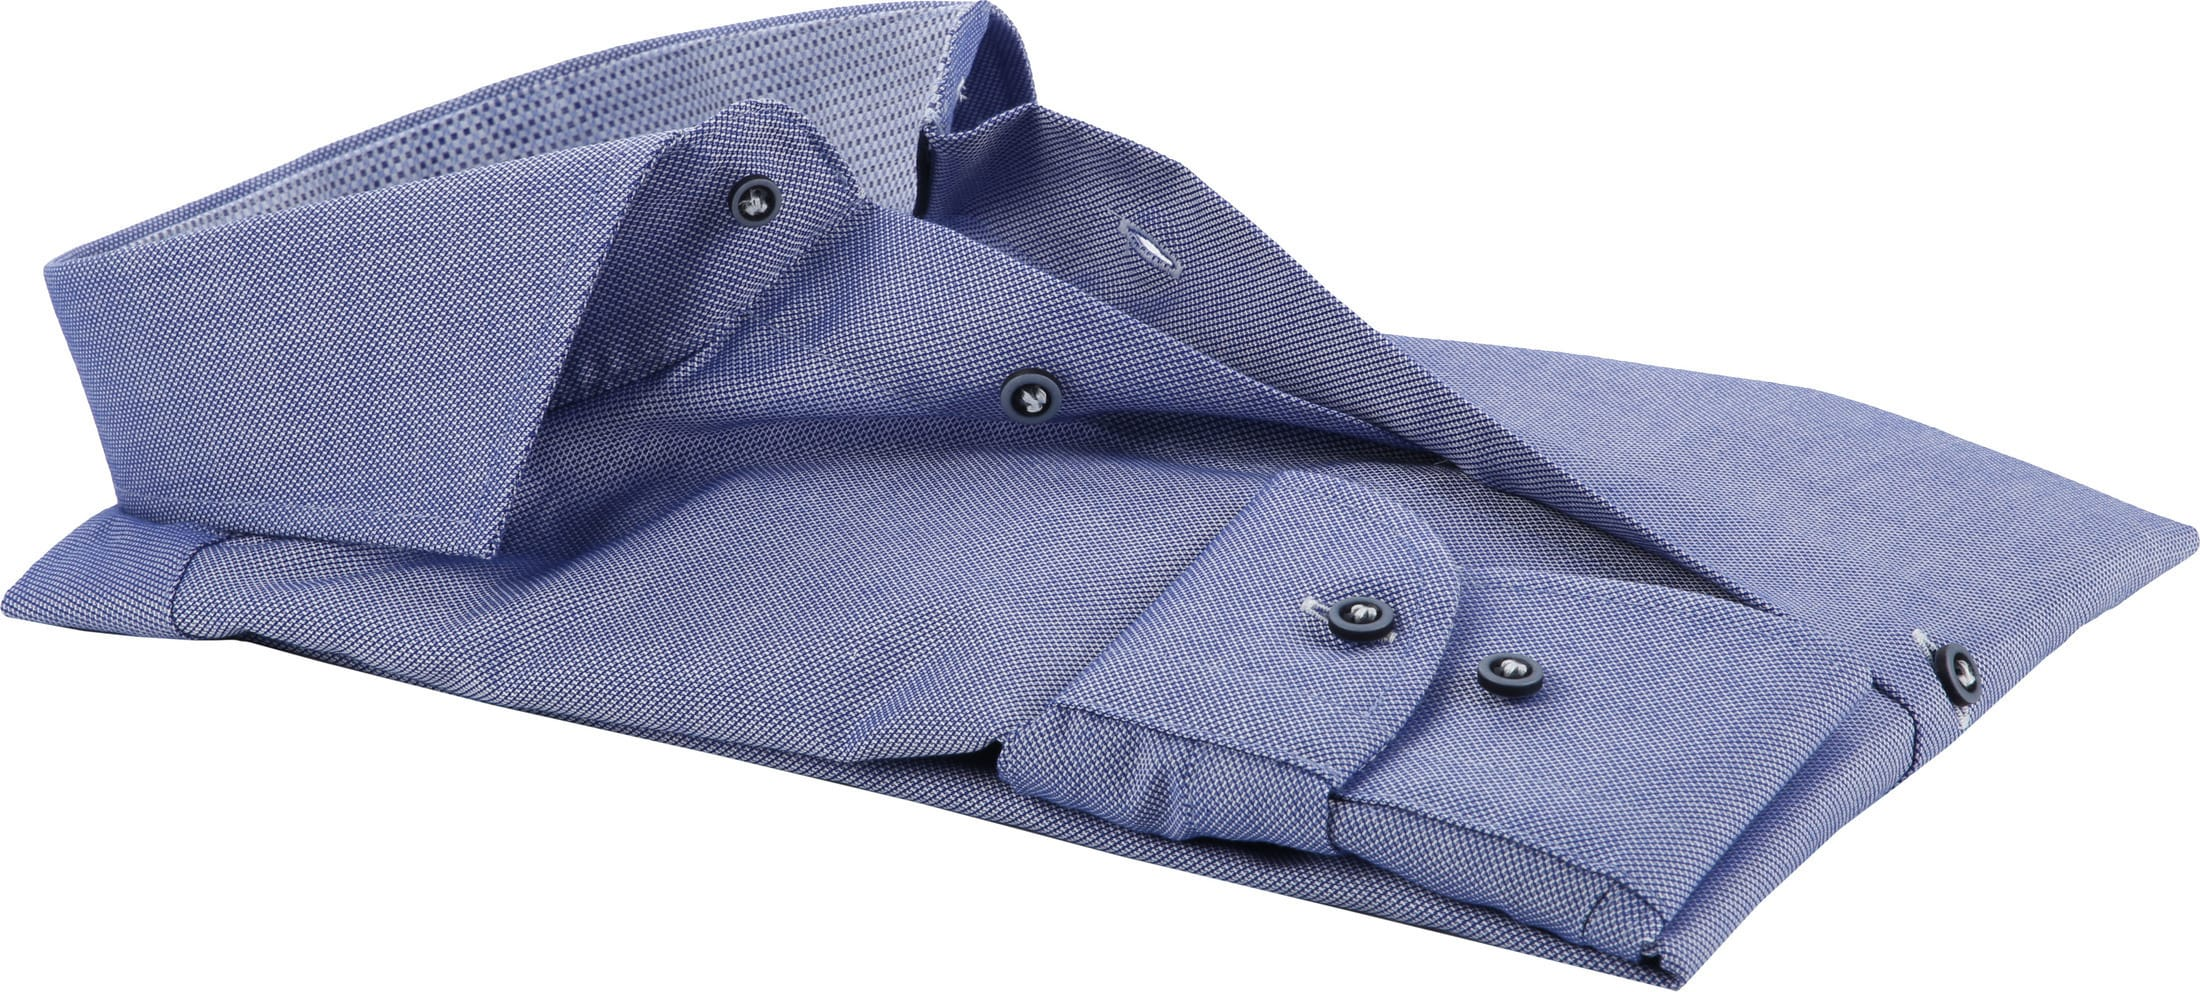 Profuomo Shirt Navy CAW foto 2